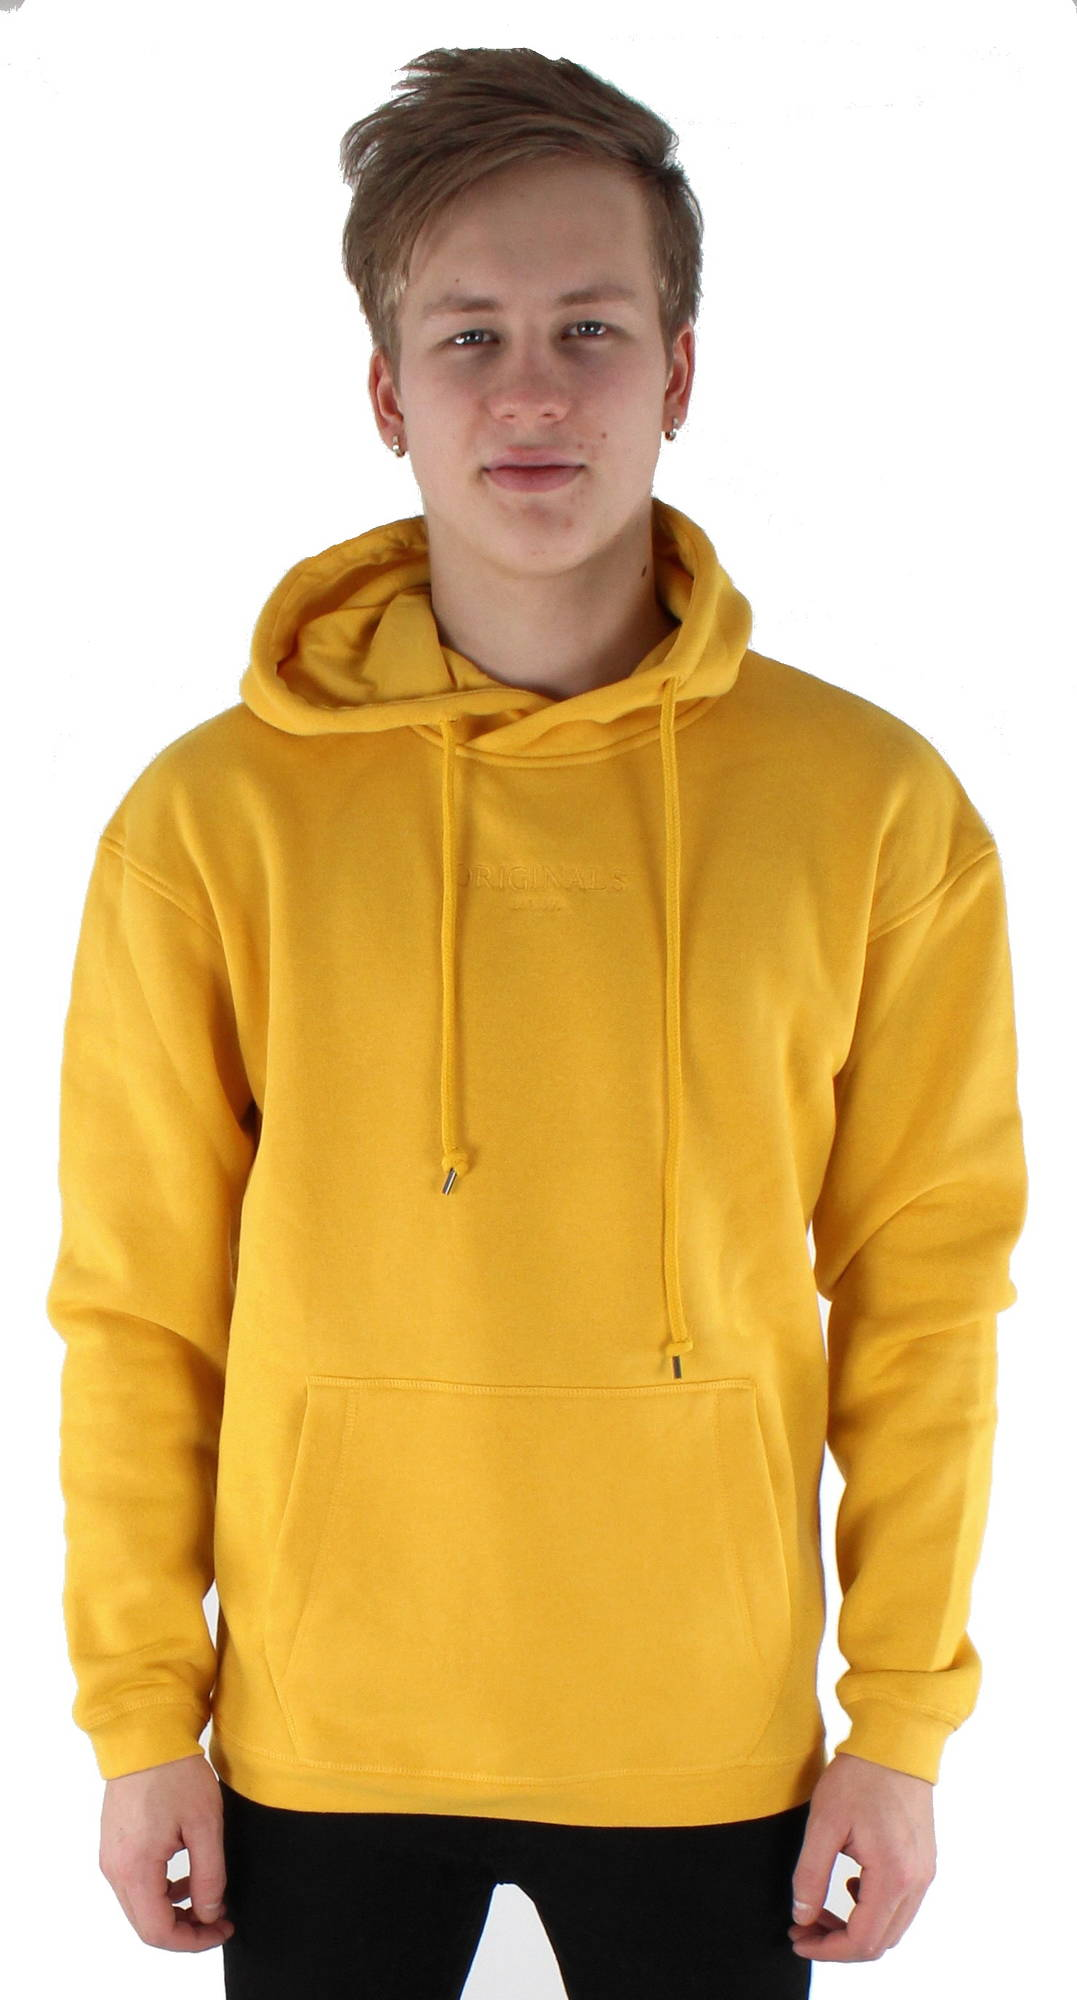 Huppari Priha 4323 hivis lk.2 keltainen m hinta 39,36€